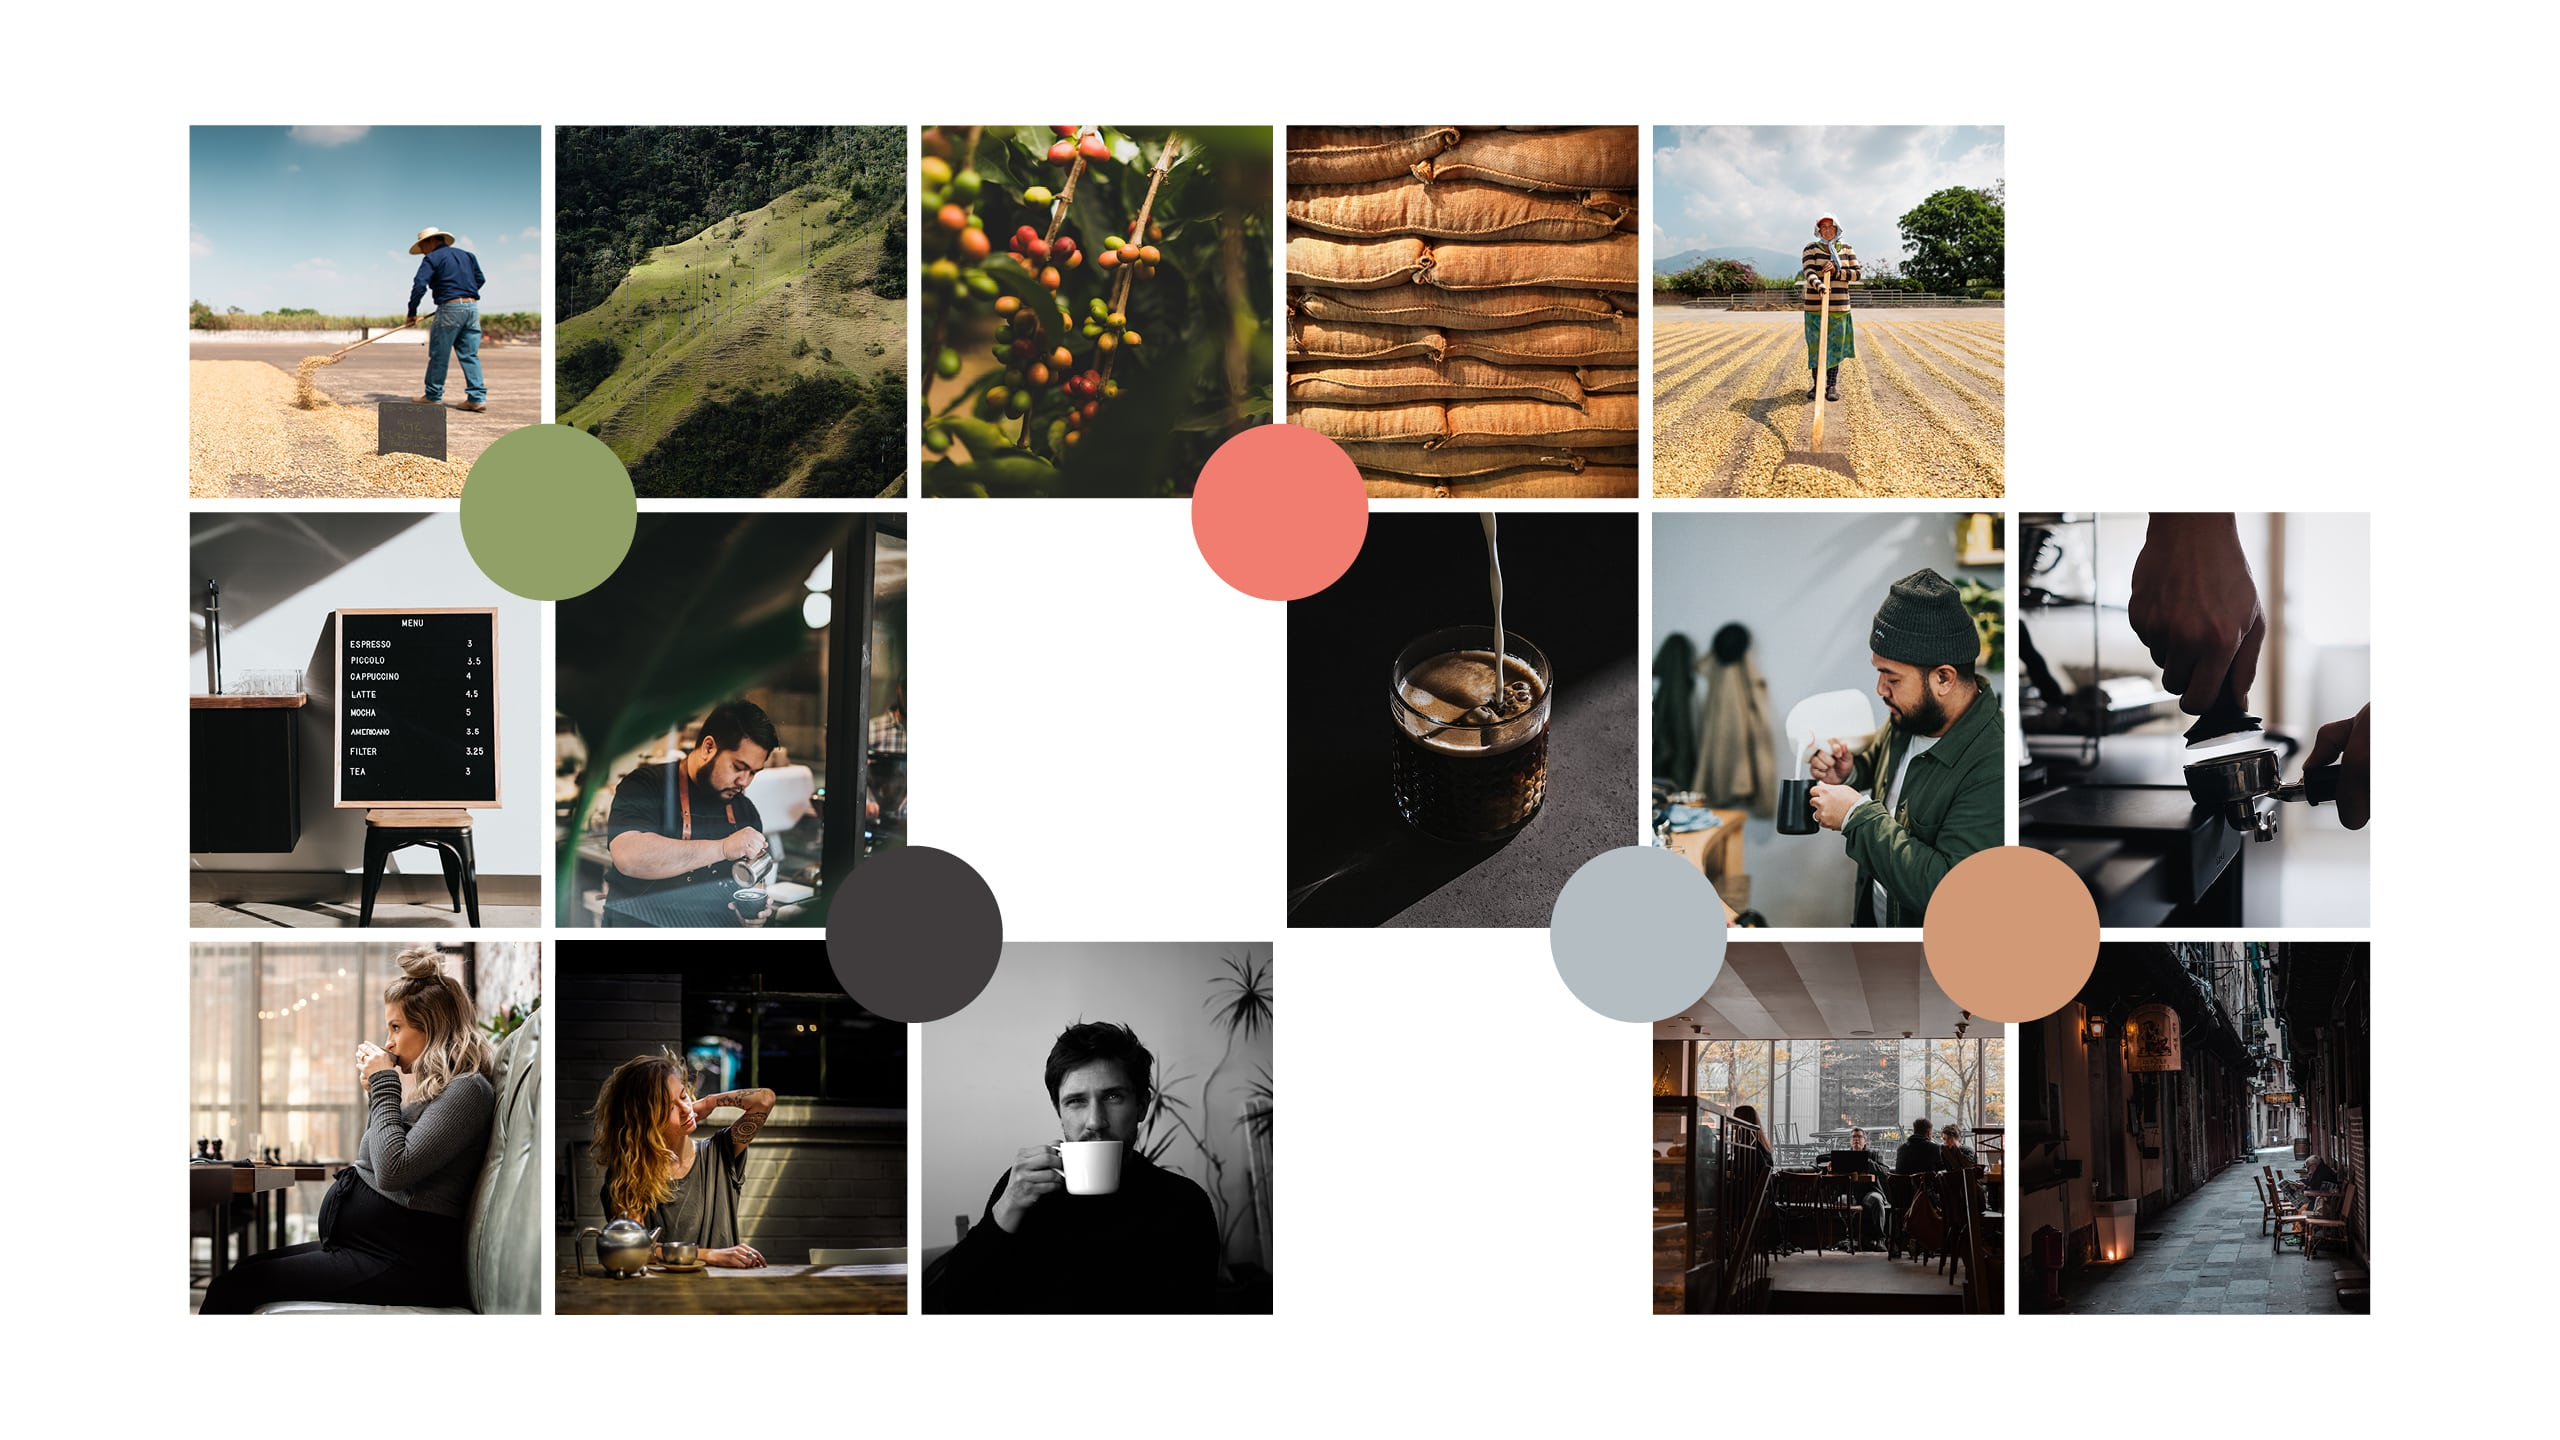 mantik-digital-branding-development-agency-creative-app-ui-web-branding-34-min